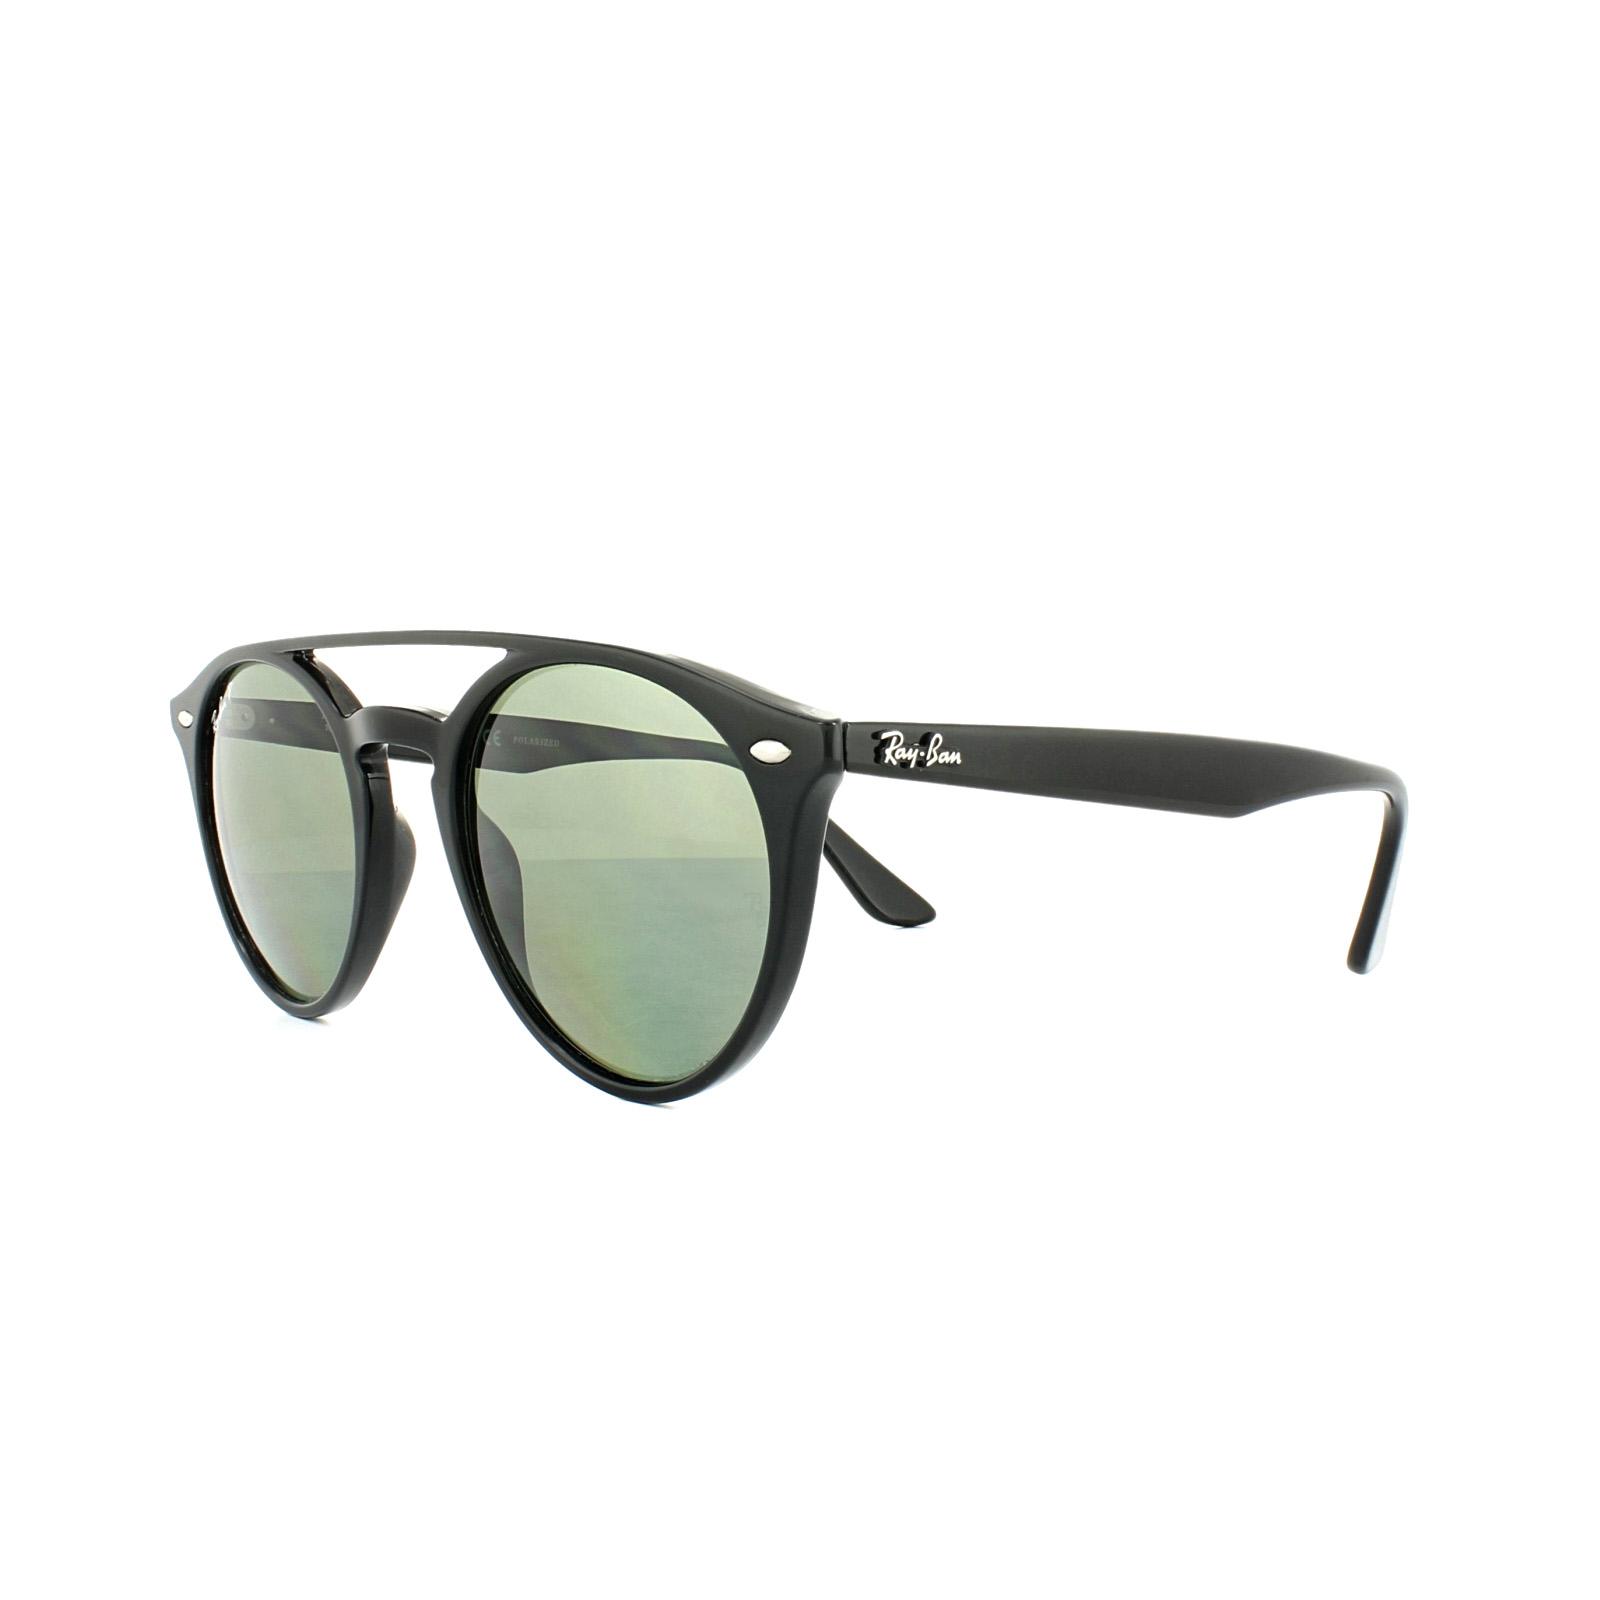 98e93096cdee Ray-Ban Sunglasses 4279 601 9A Black Green Polarized 8053672730586 ...